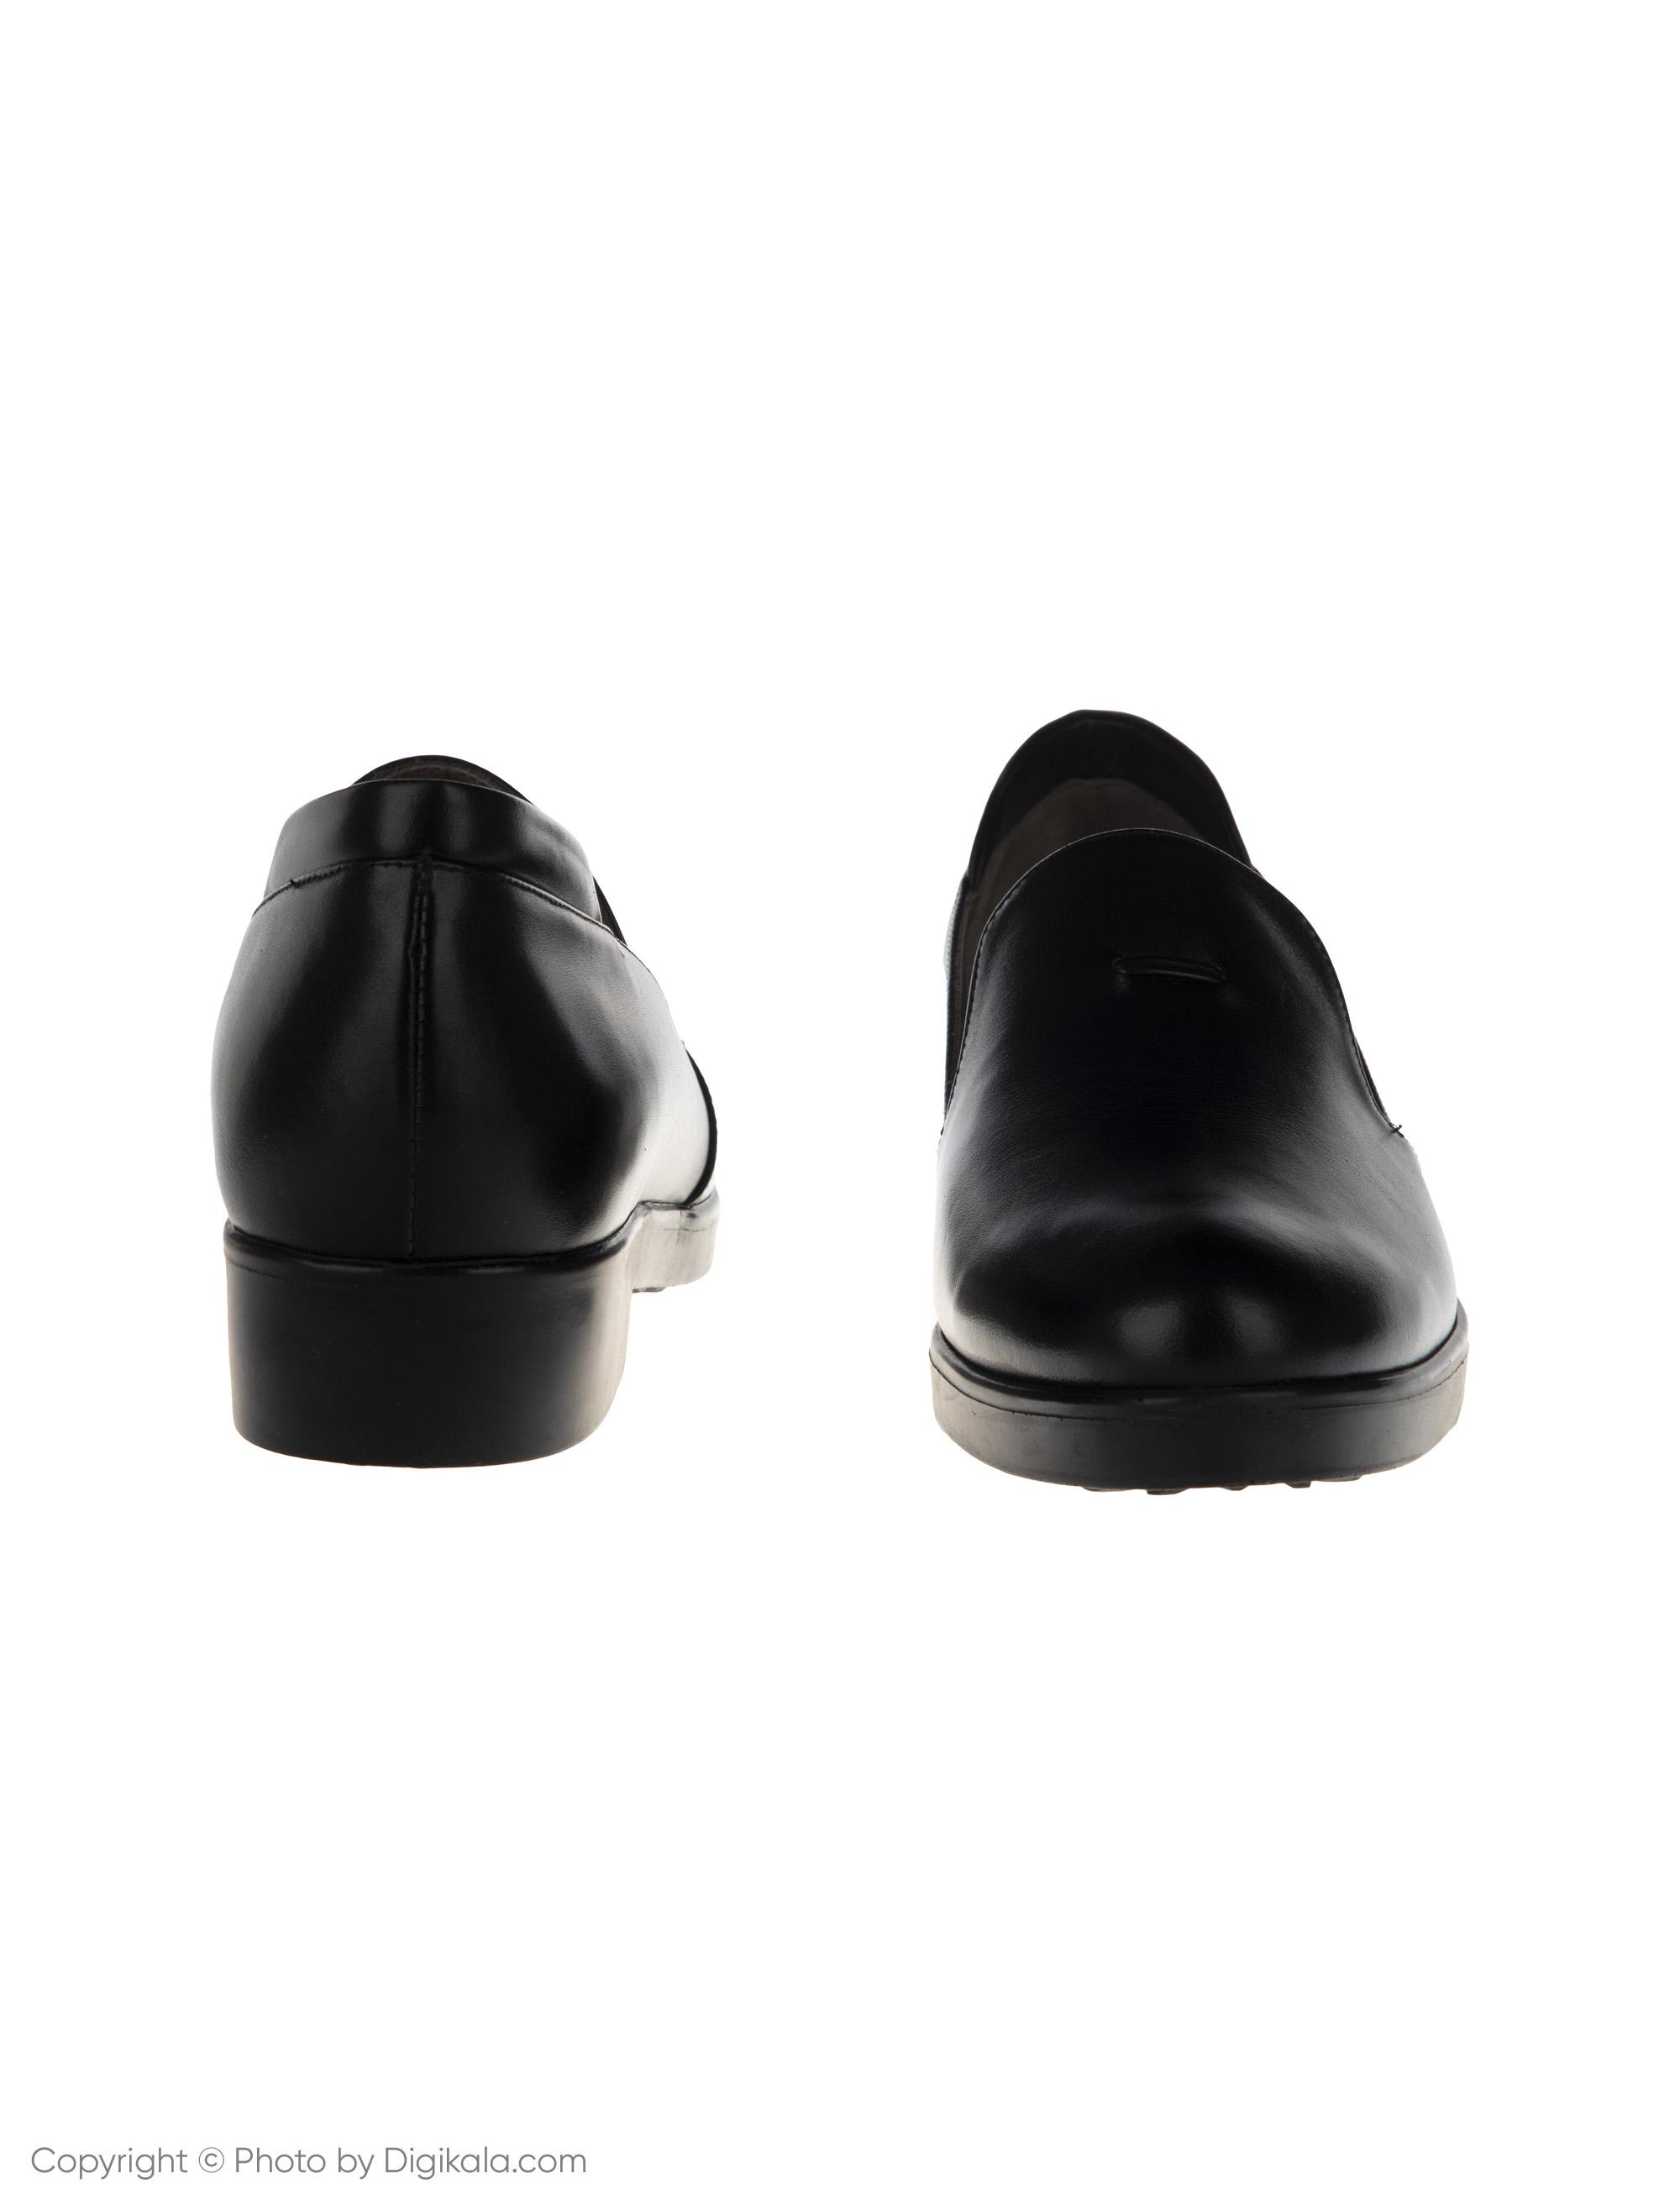 کفش روزمره زنانه شیفر مدل 5190A-101 -  - 4